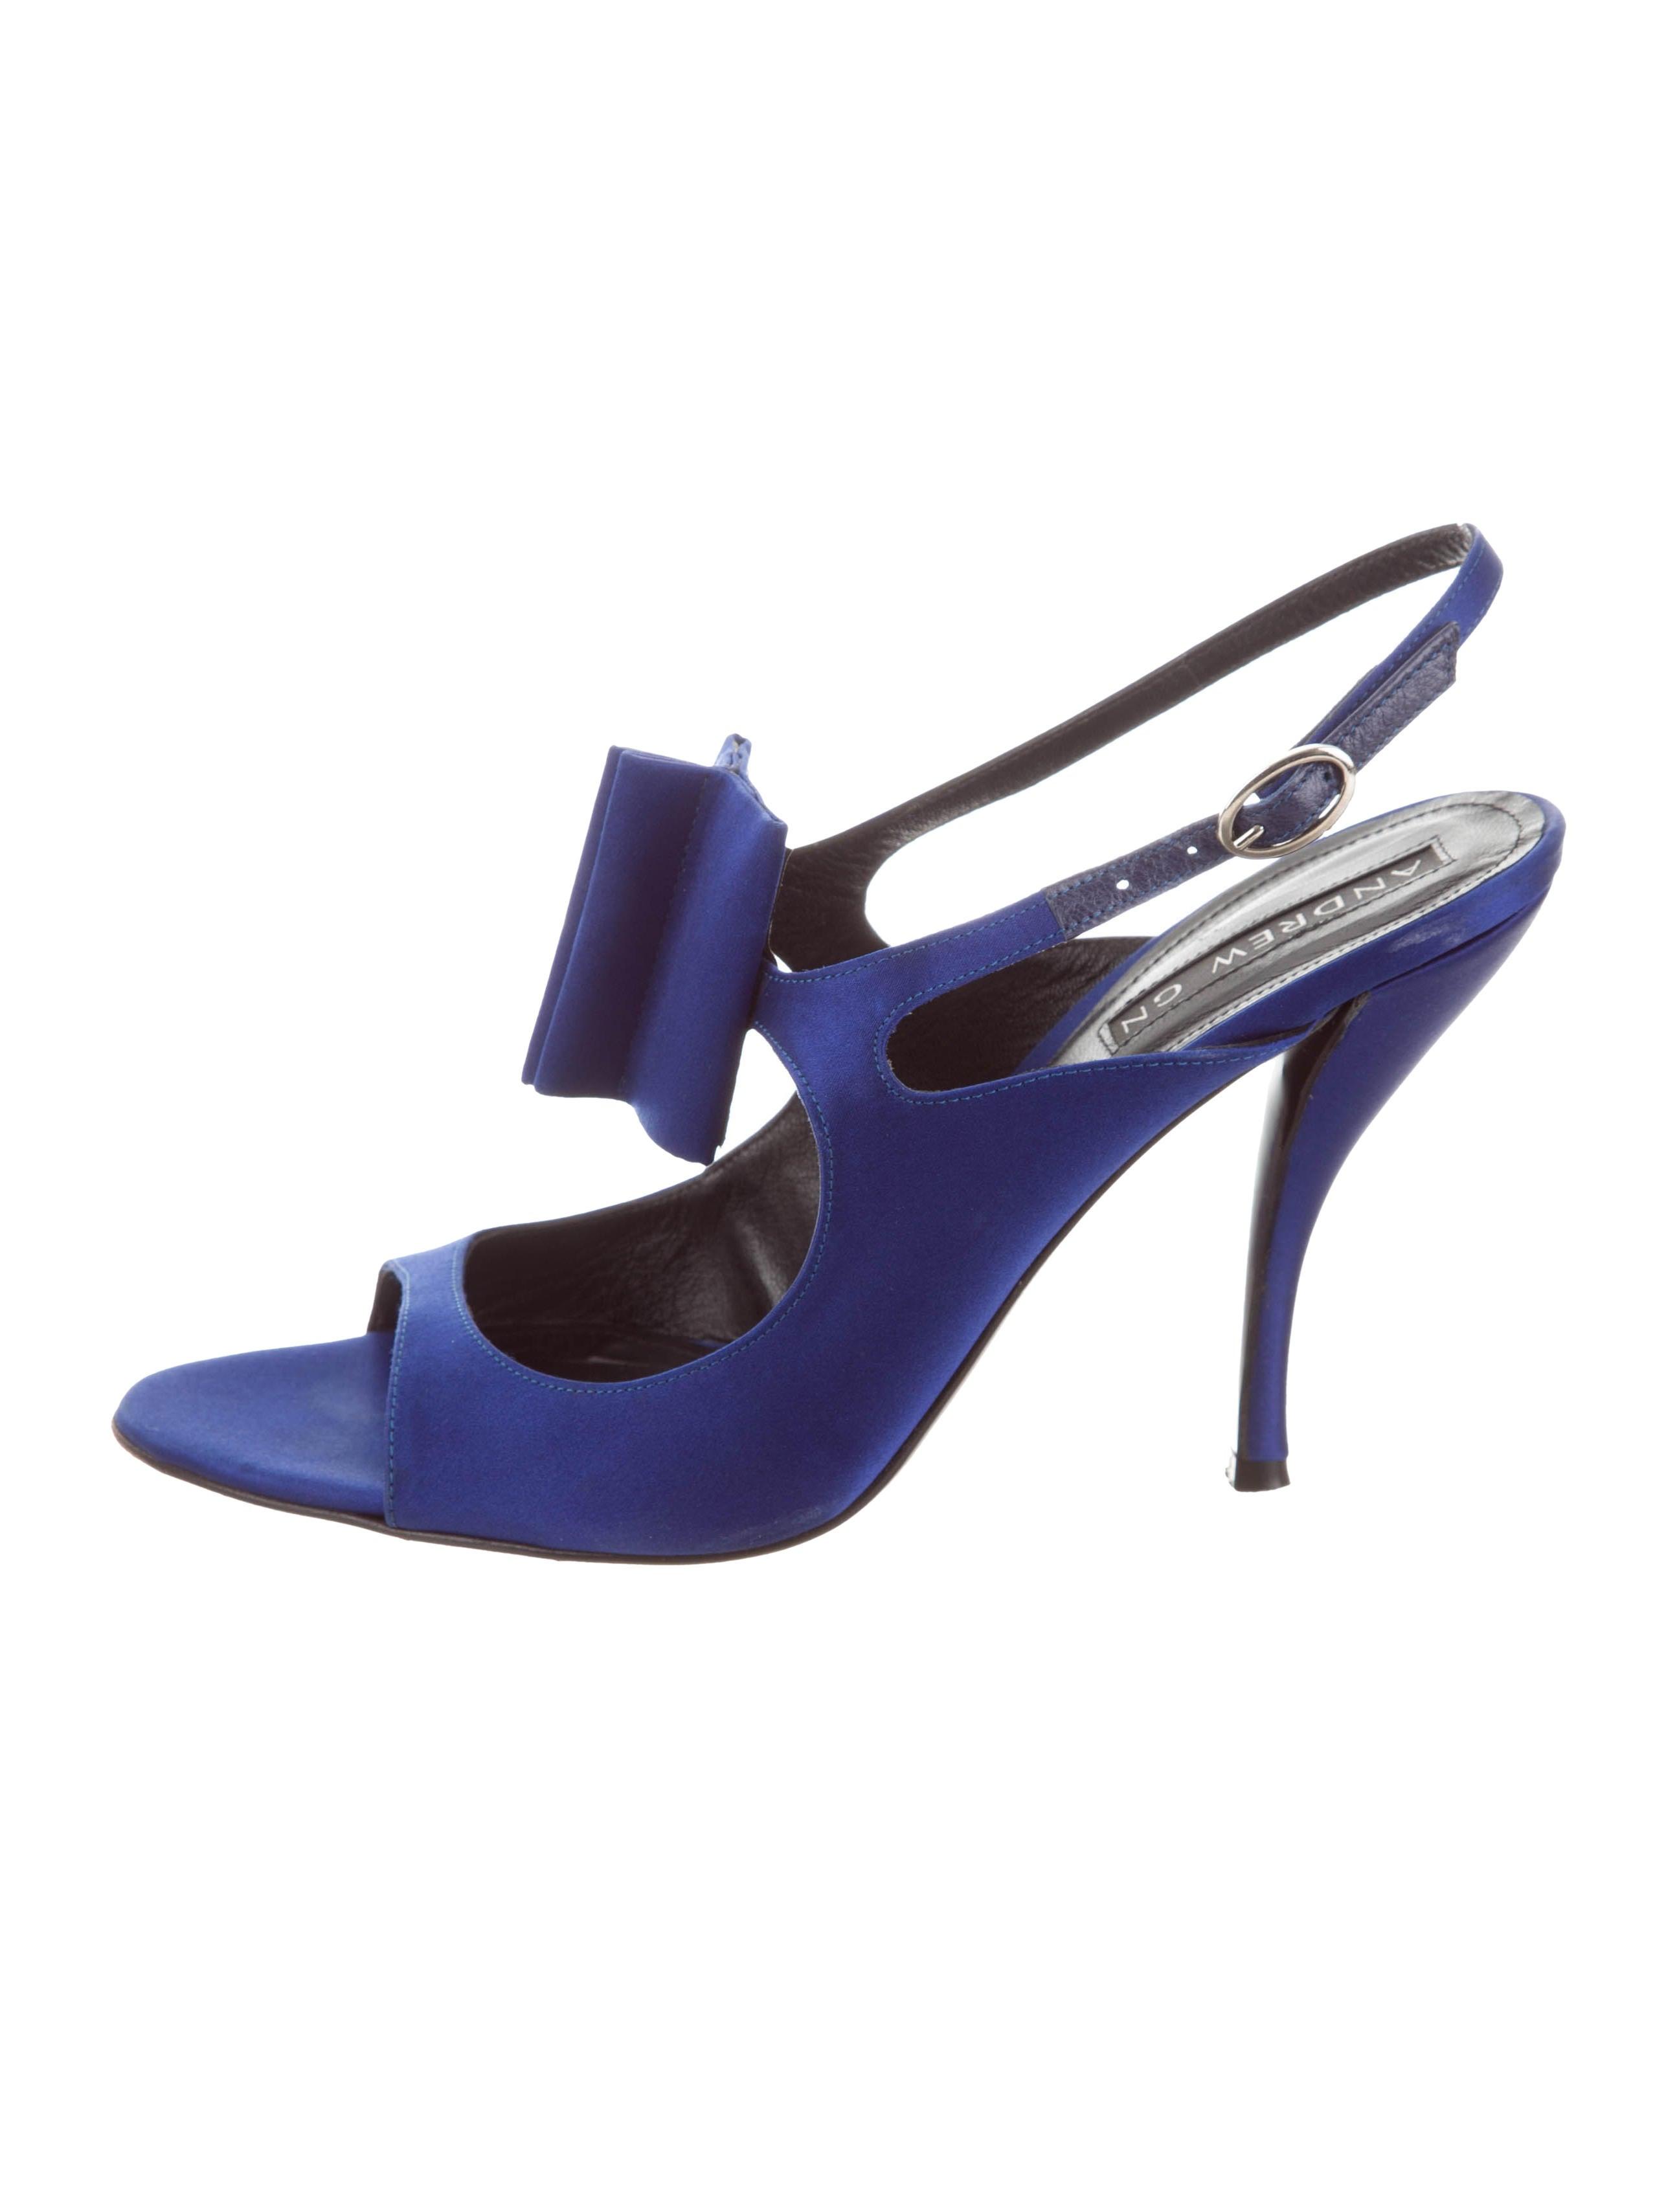 clearance shop for Andrew Gn Satin Bow Sandals finishline sale online cheap best sale for sale footlocker cheap sneakernews kH9bF8k